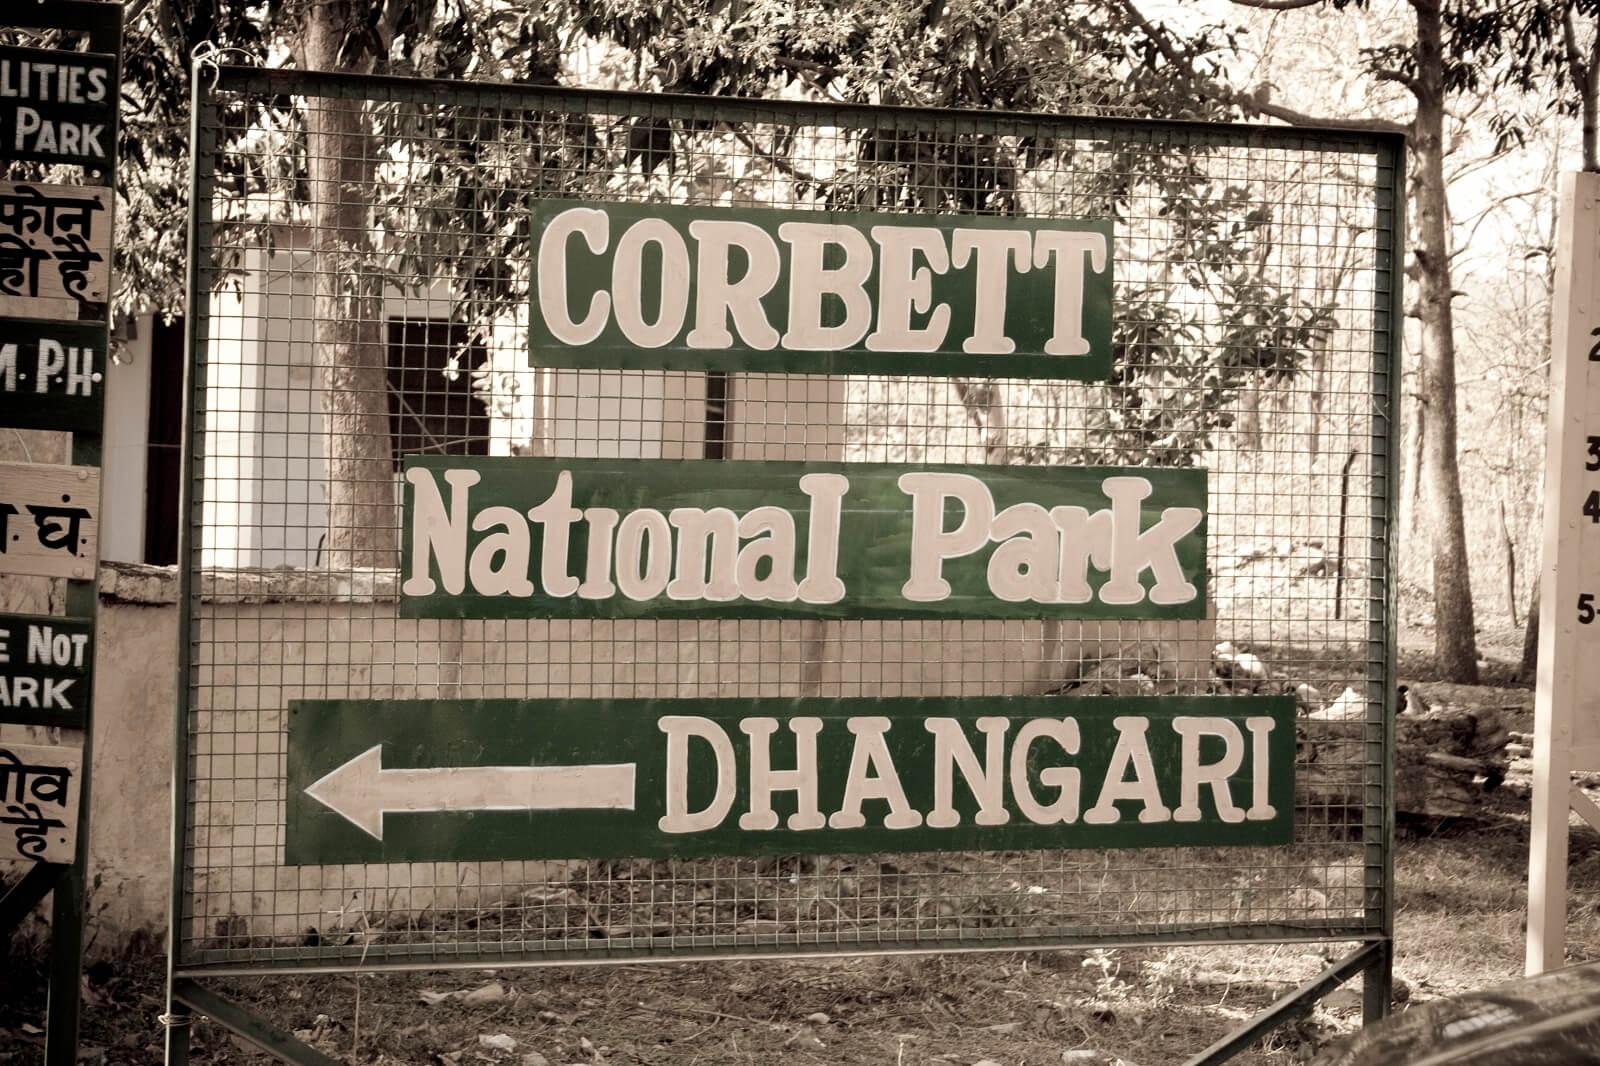 Corbett-Mohan